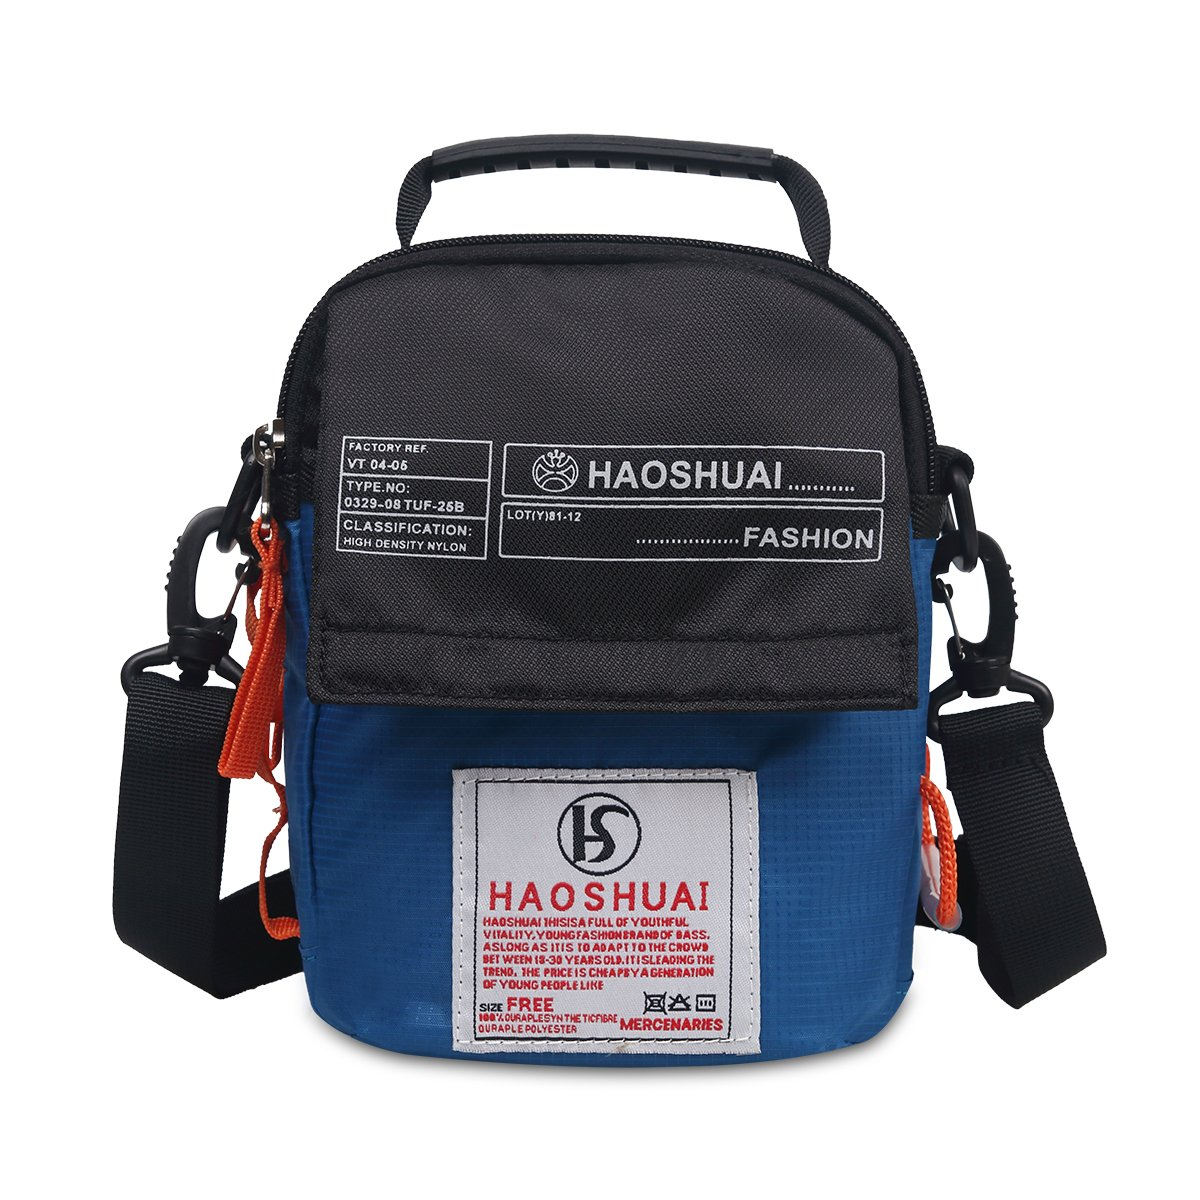 JAKAGO Waterproof Shoulder Bag Belt Universal Small Messenger Bag Handbag Mobile Phone Pouch Cross Body Bag Purse with Shoulder Strap for Outdoor Sport Travel Hiking Camping (Light Blue) by JAKAGO